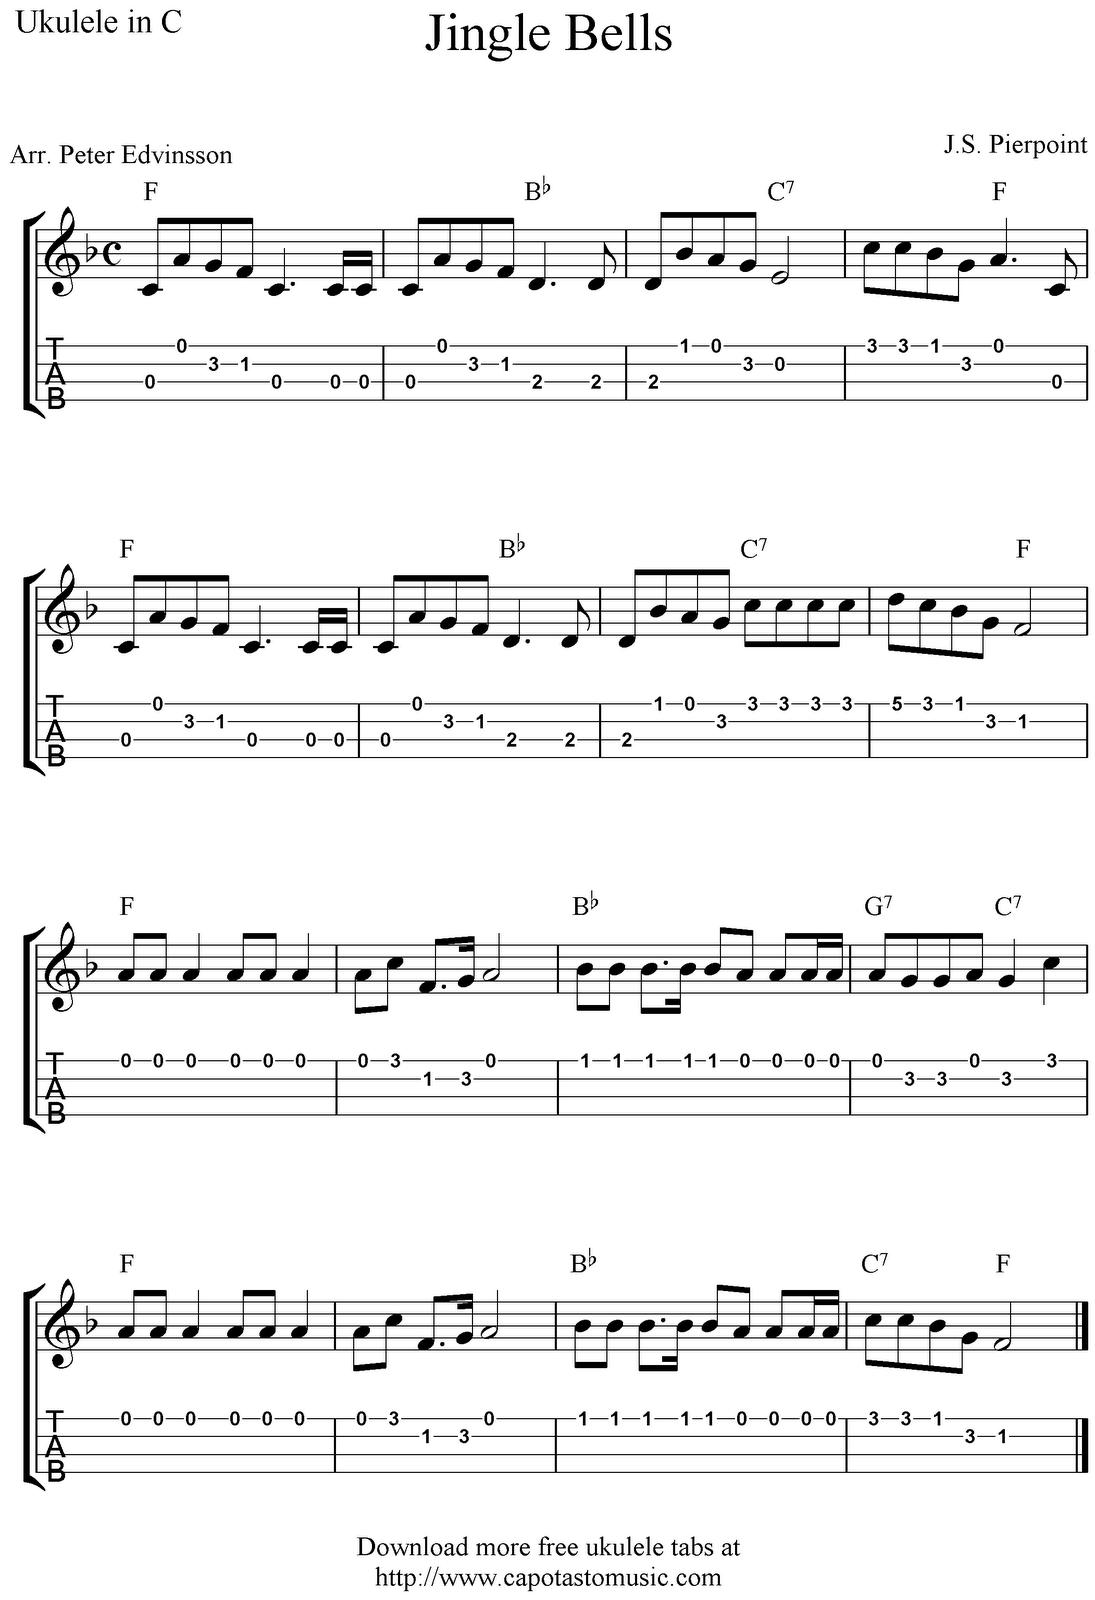 Free Sheet Music Scores Jingle Bells Free Christmas Ukulele Tab Sheet Music